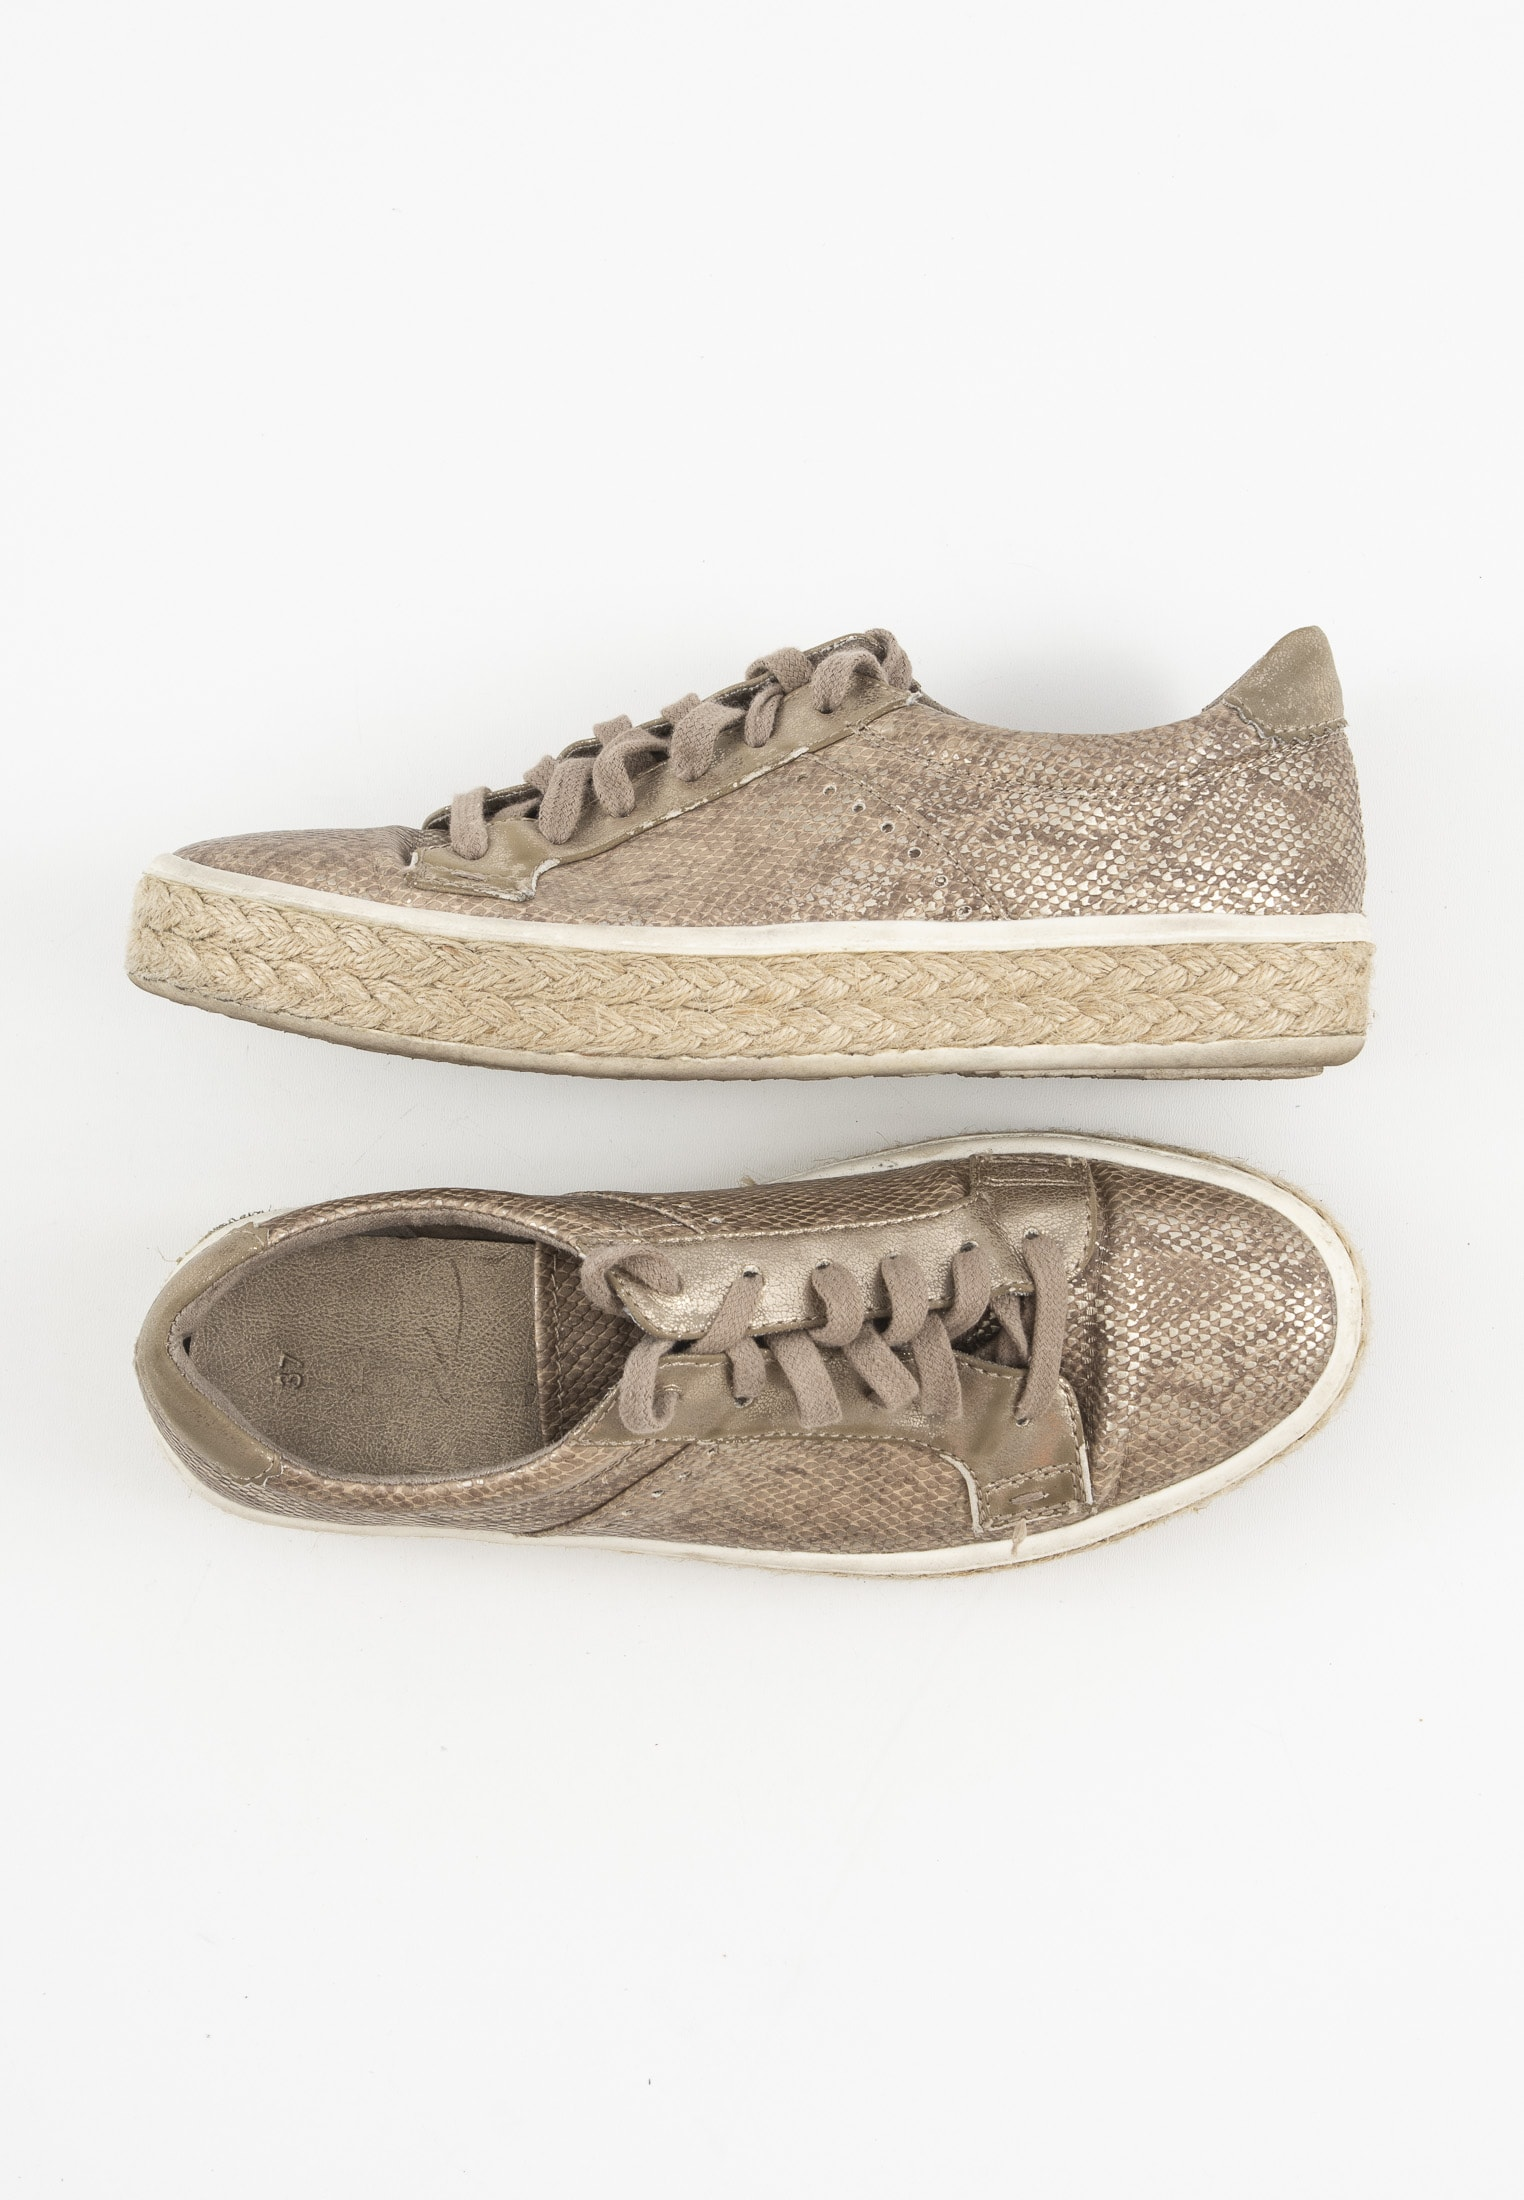 Tamaris Sneakers Braun Gr.37